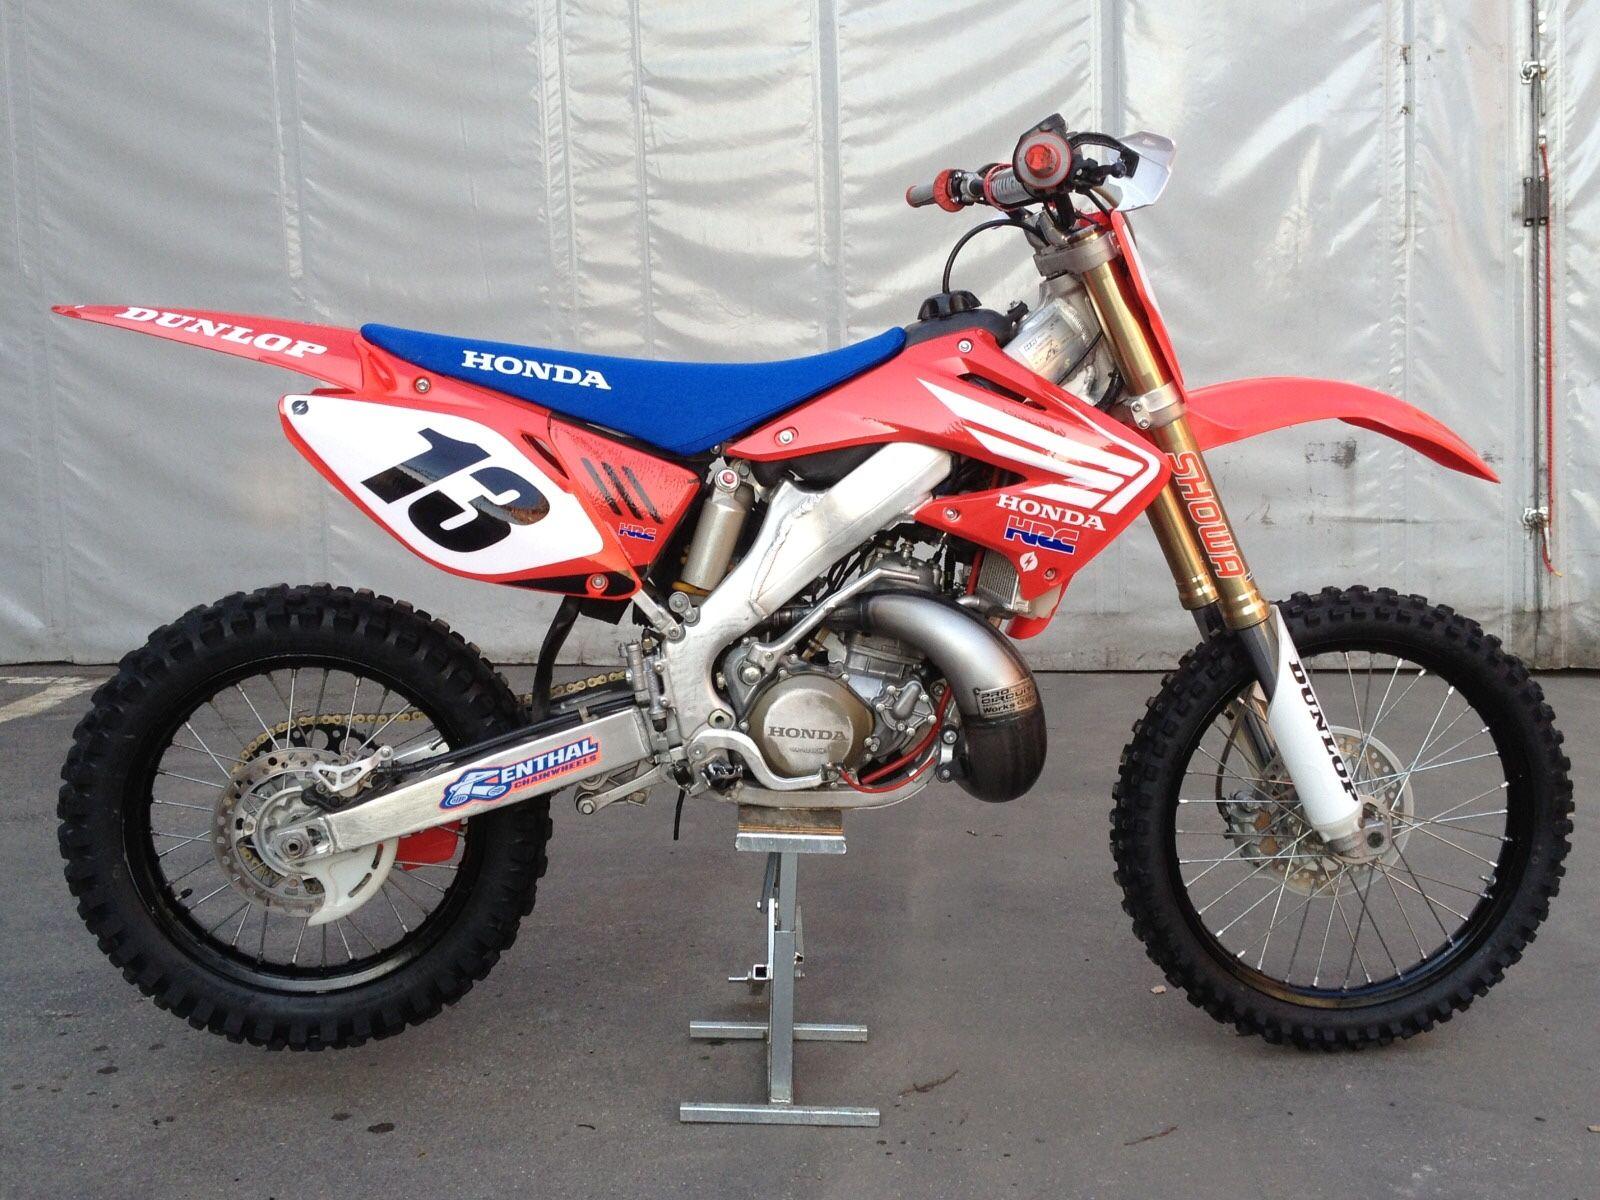 091b18ea35be0d122030f0453c9c949d Jpg 1600 1200 Honda Dirt Bike Motocross Bikes Moto Bike